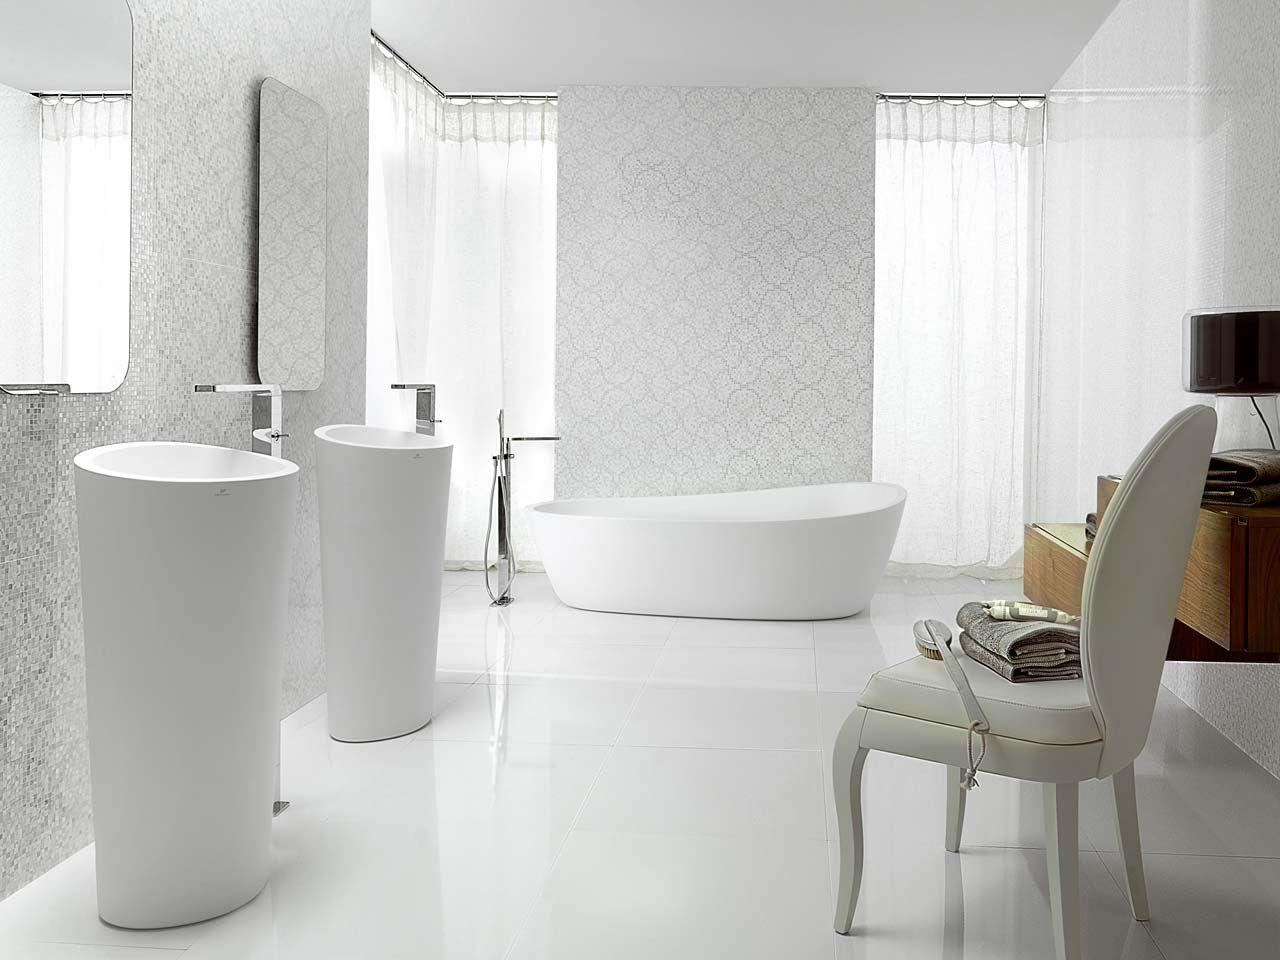 Elegant Bathroom With Porcelanosa S Tiles Floor Tiles Crystal Flower White Wall Tiles Nacare Bathroom Furniture Design Bathroom Wall Tile Bathroom Design